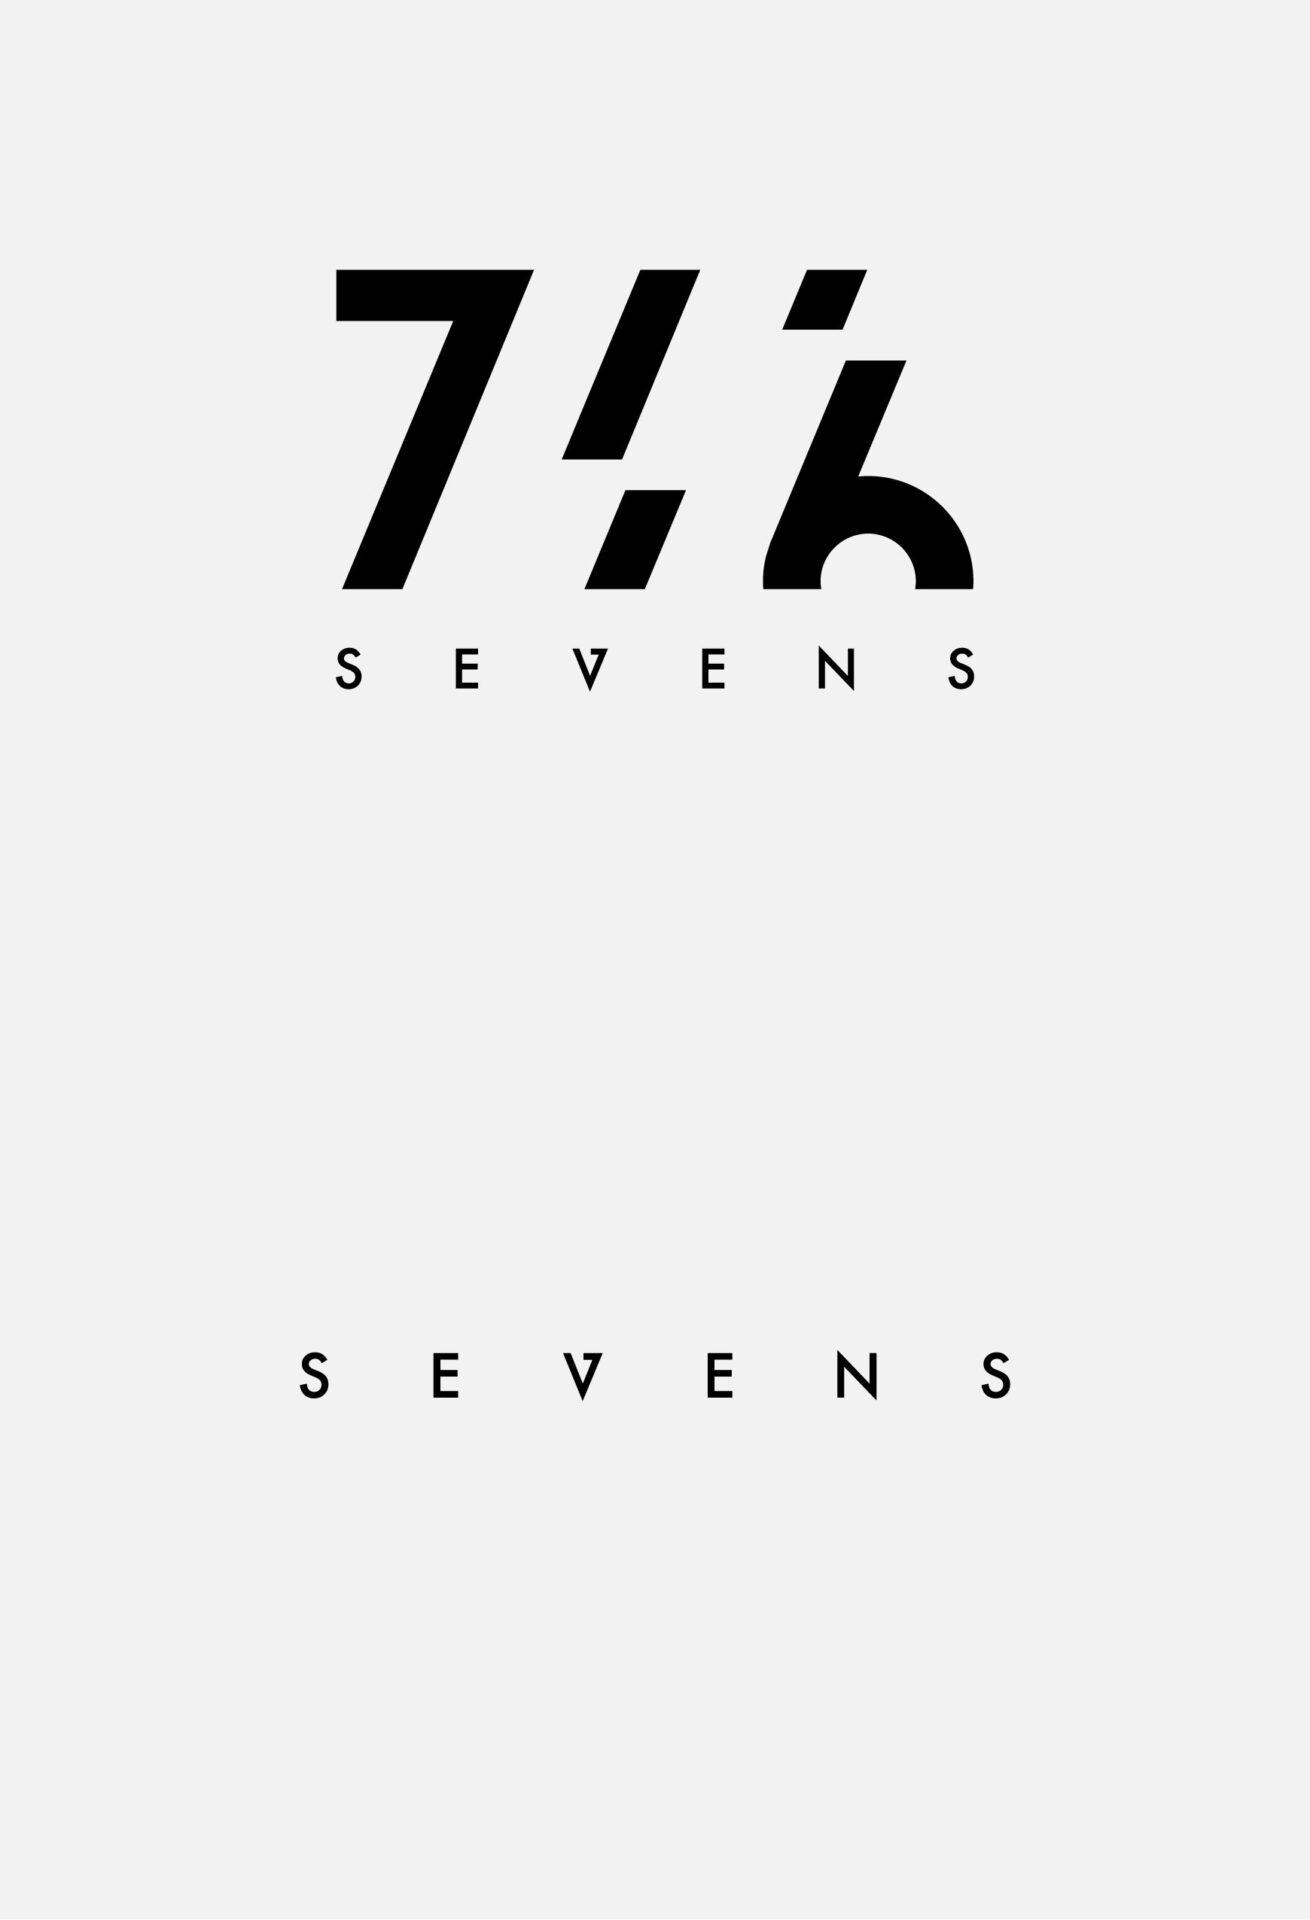 「SEVENS」の実績画像